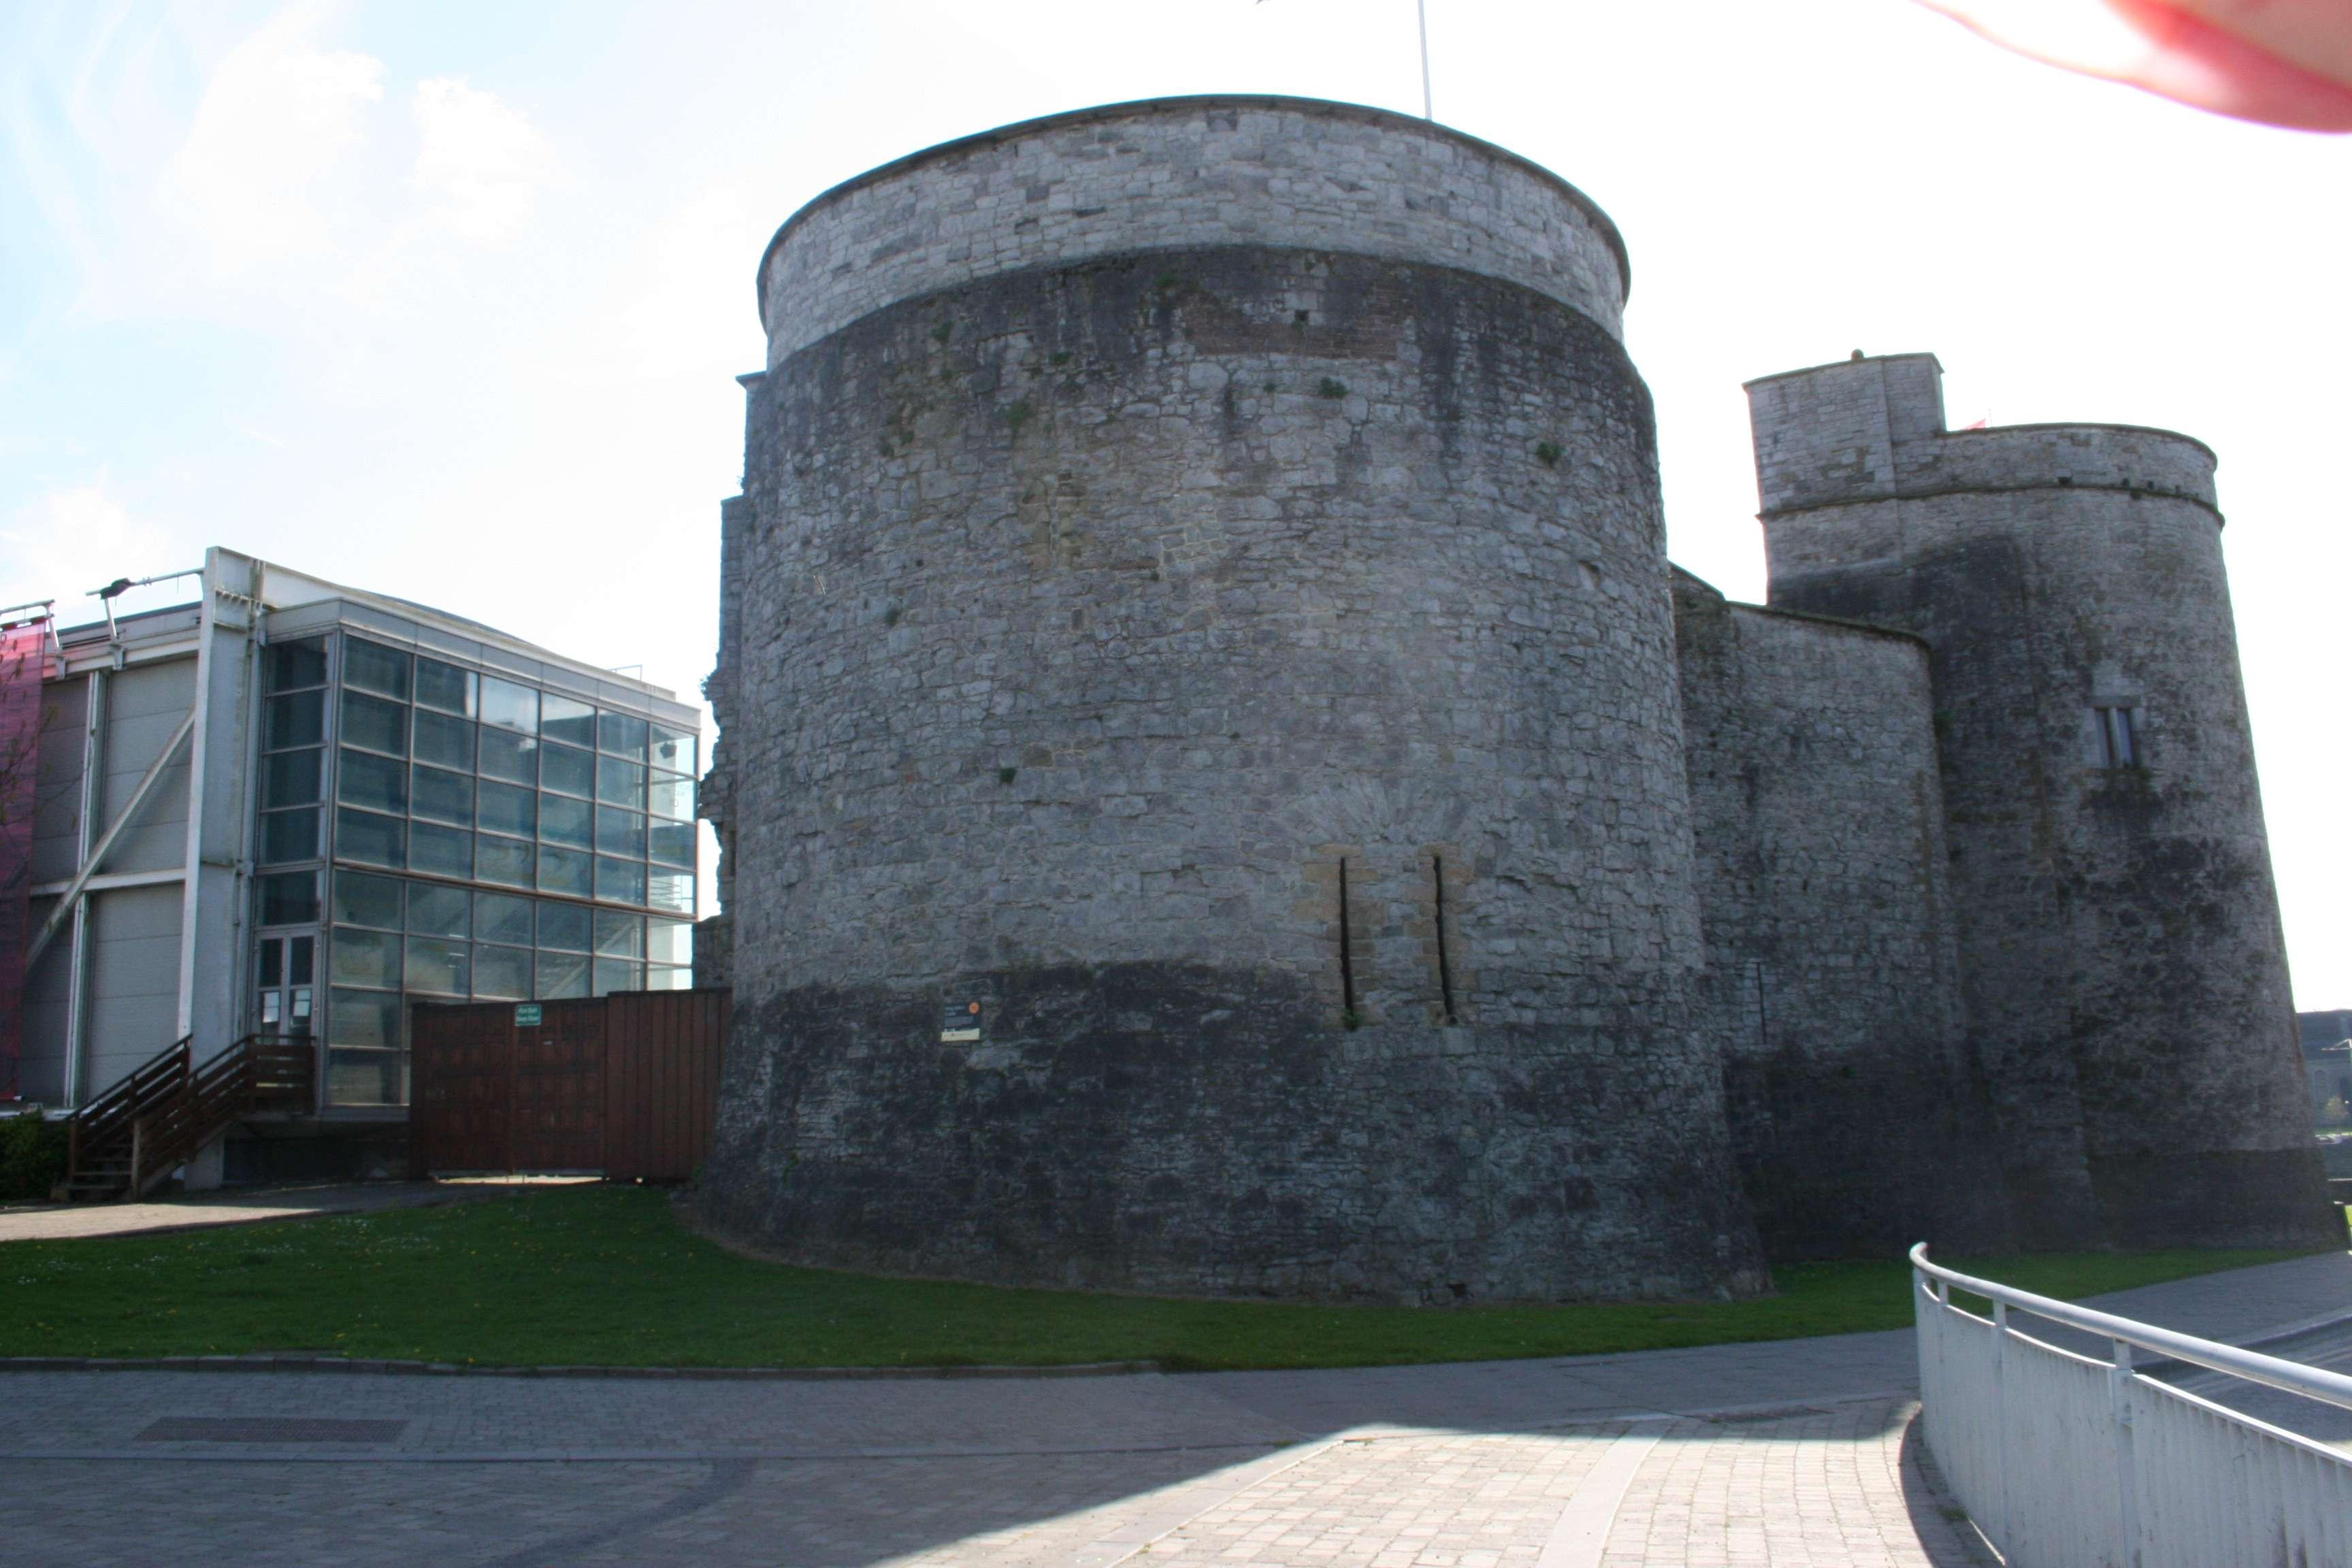 190 King John's Castle, Limerick, le 29 04